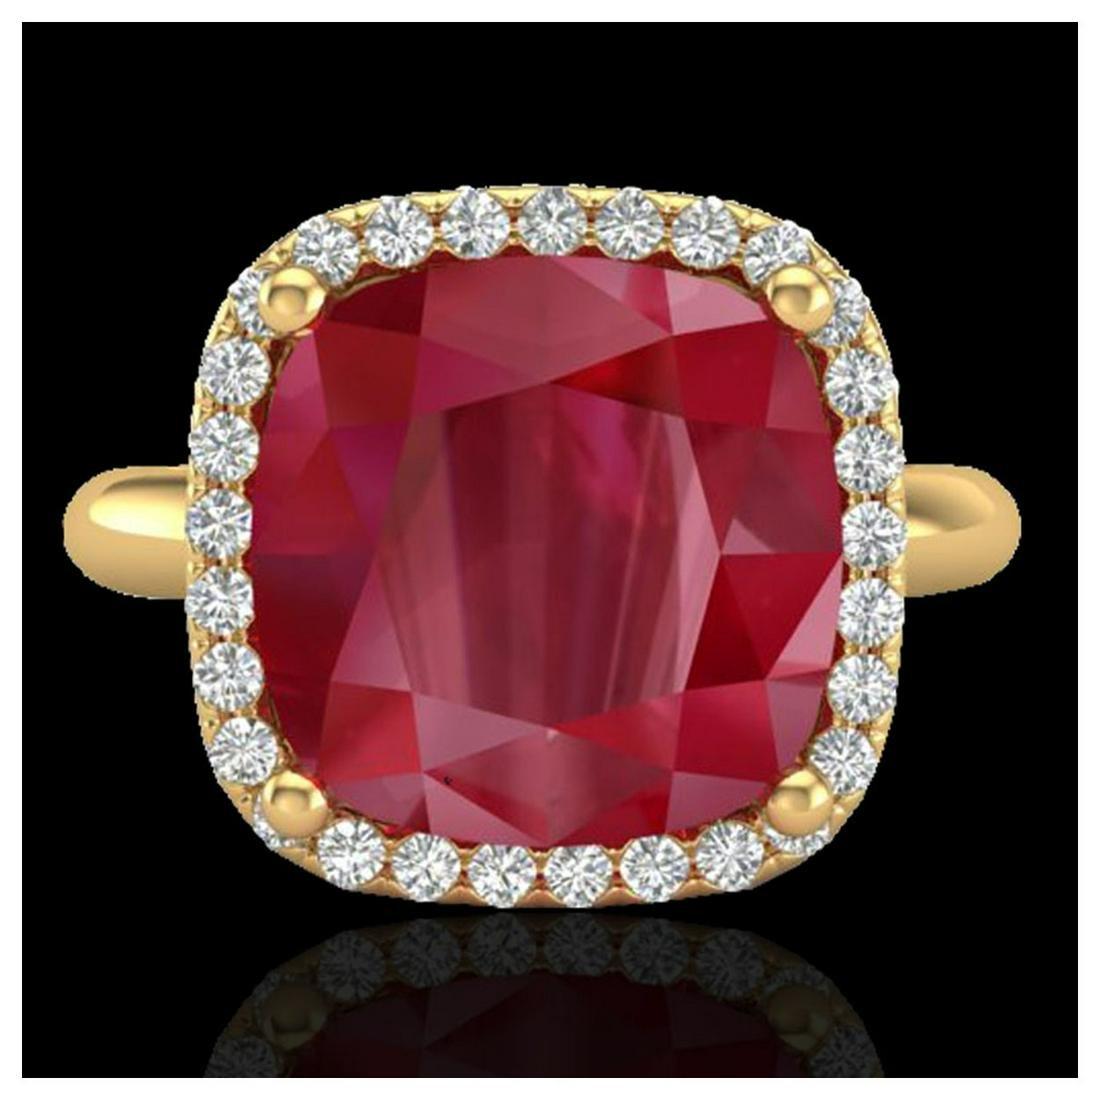 6 ctw Ruby & VS/SI Diamond Ring 18K Yellow Gold -